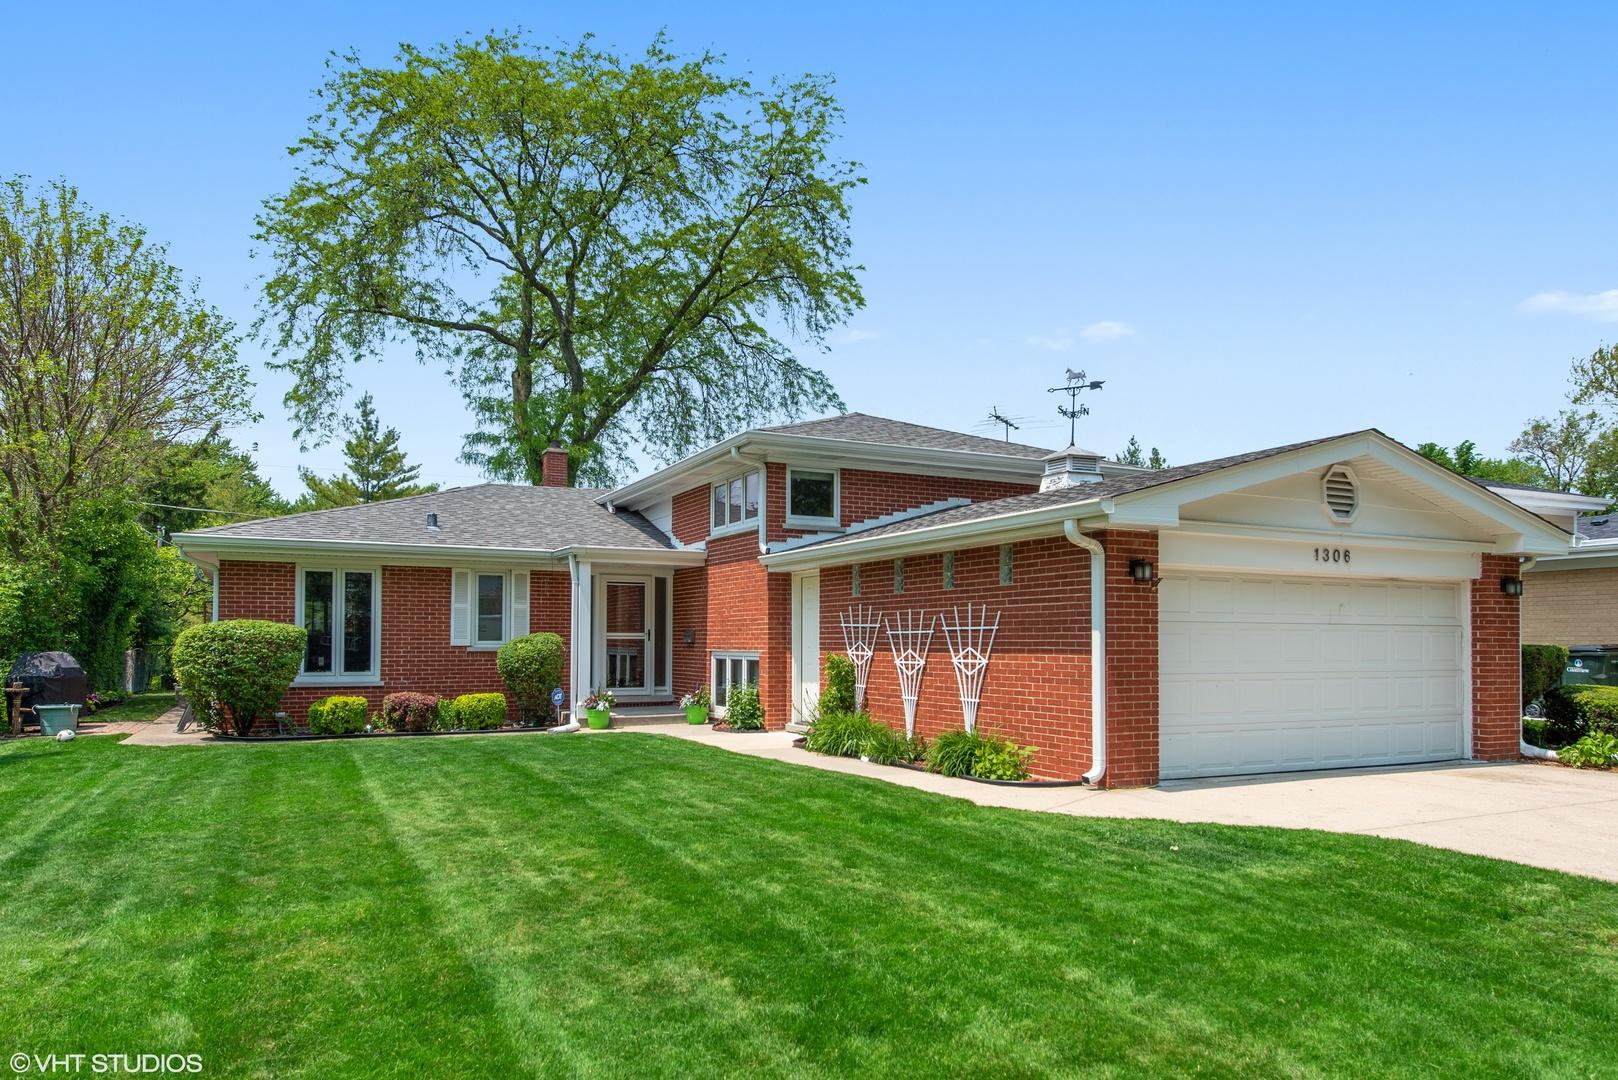 1306 Hawthorne Lane, Glenview, Illinois